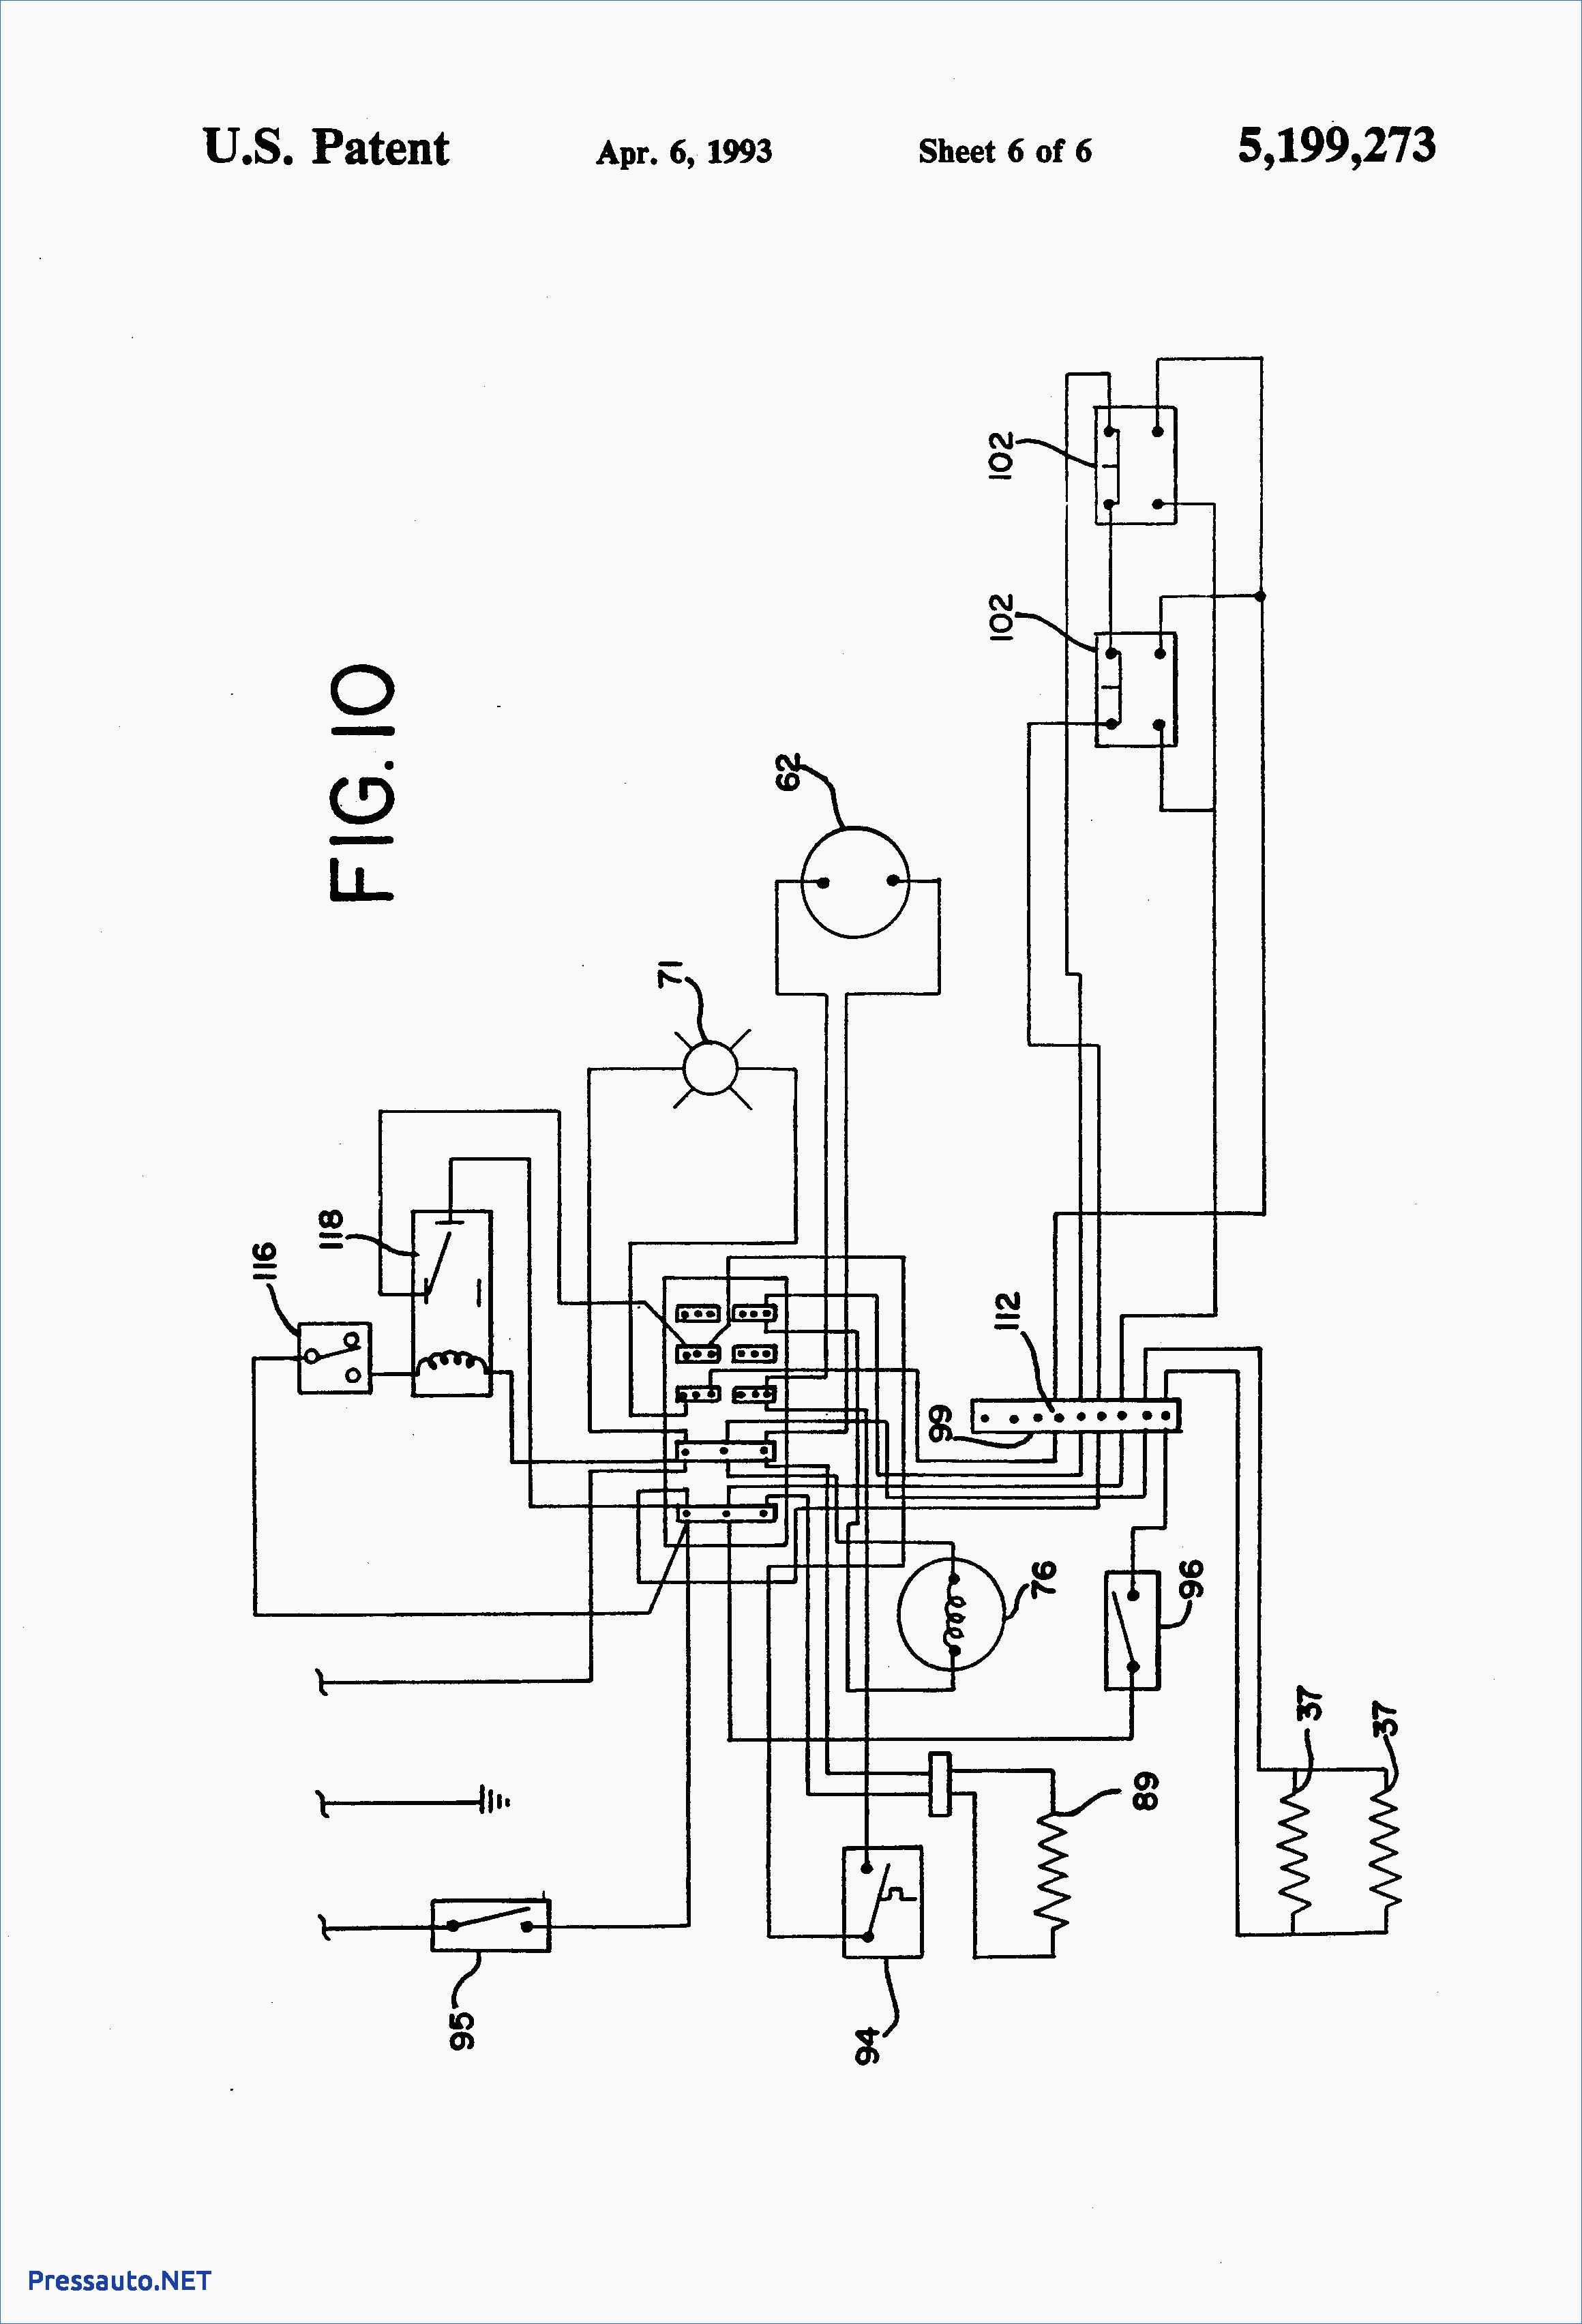 FC_3212] True T 23 Refrigeration Wiring Diagram Wiring Diagram | True Refrigeration Wiring Diagrams |  | Targ Gram Cosm Exmet Mohammedshrine Librar Wiring 101